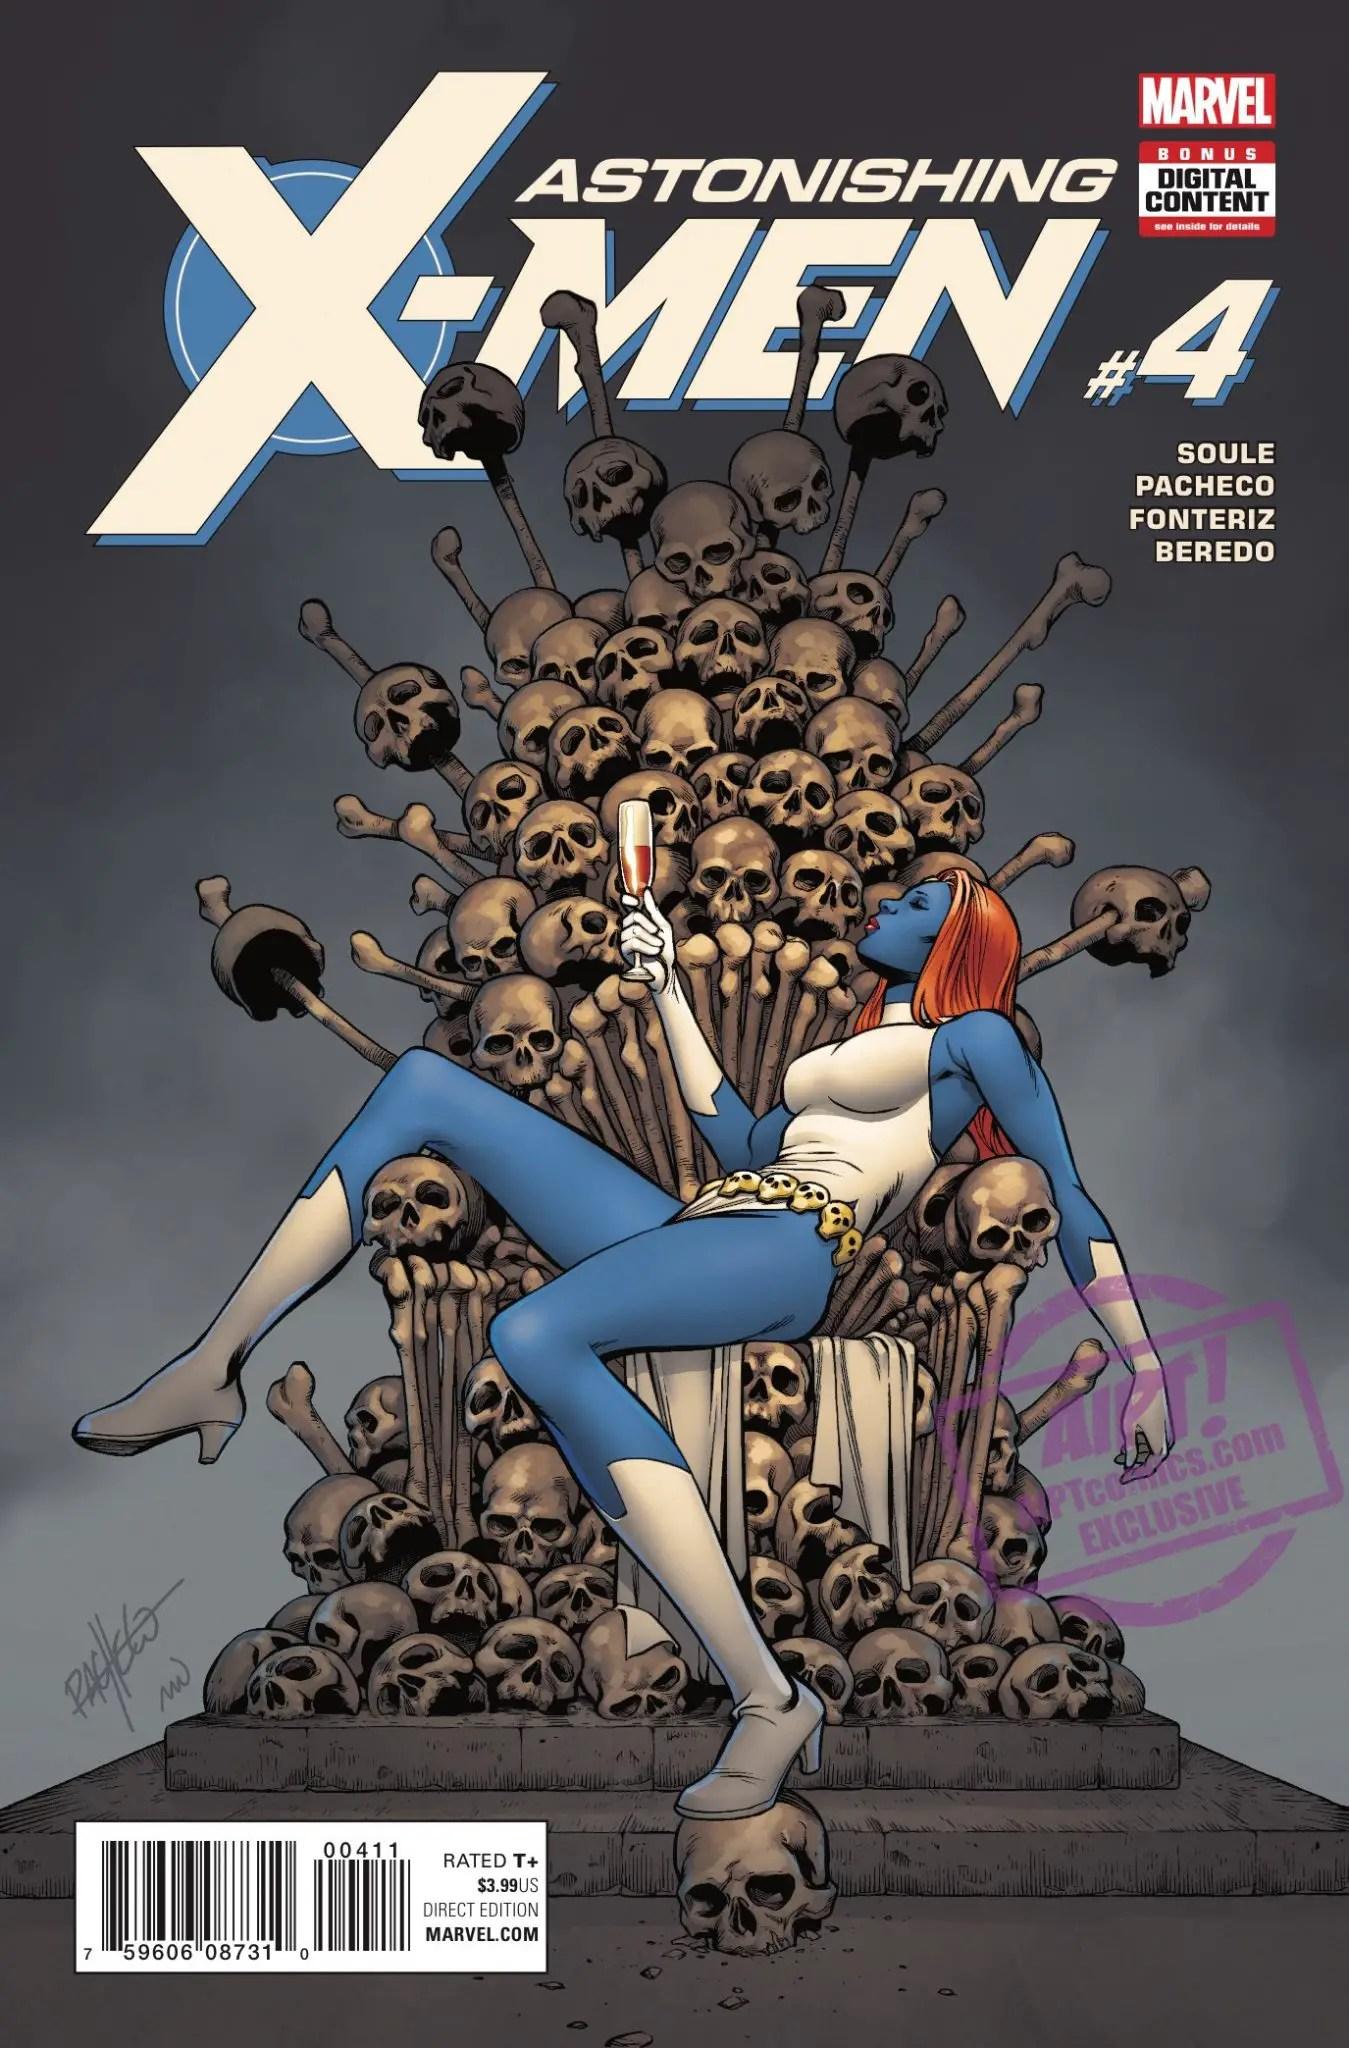 Astonishing X-Men #4 Review